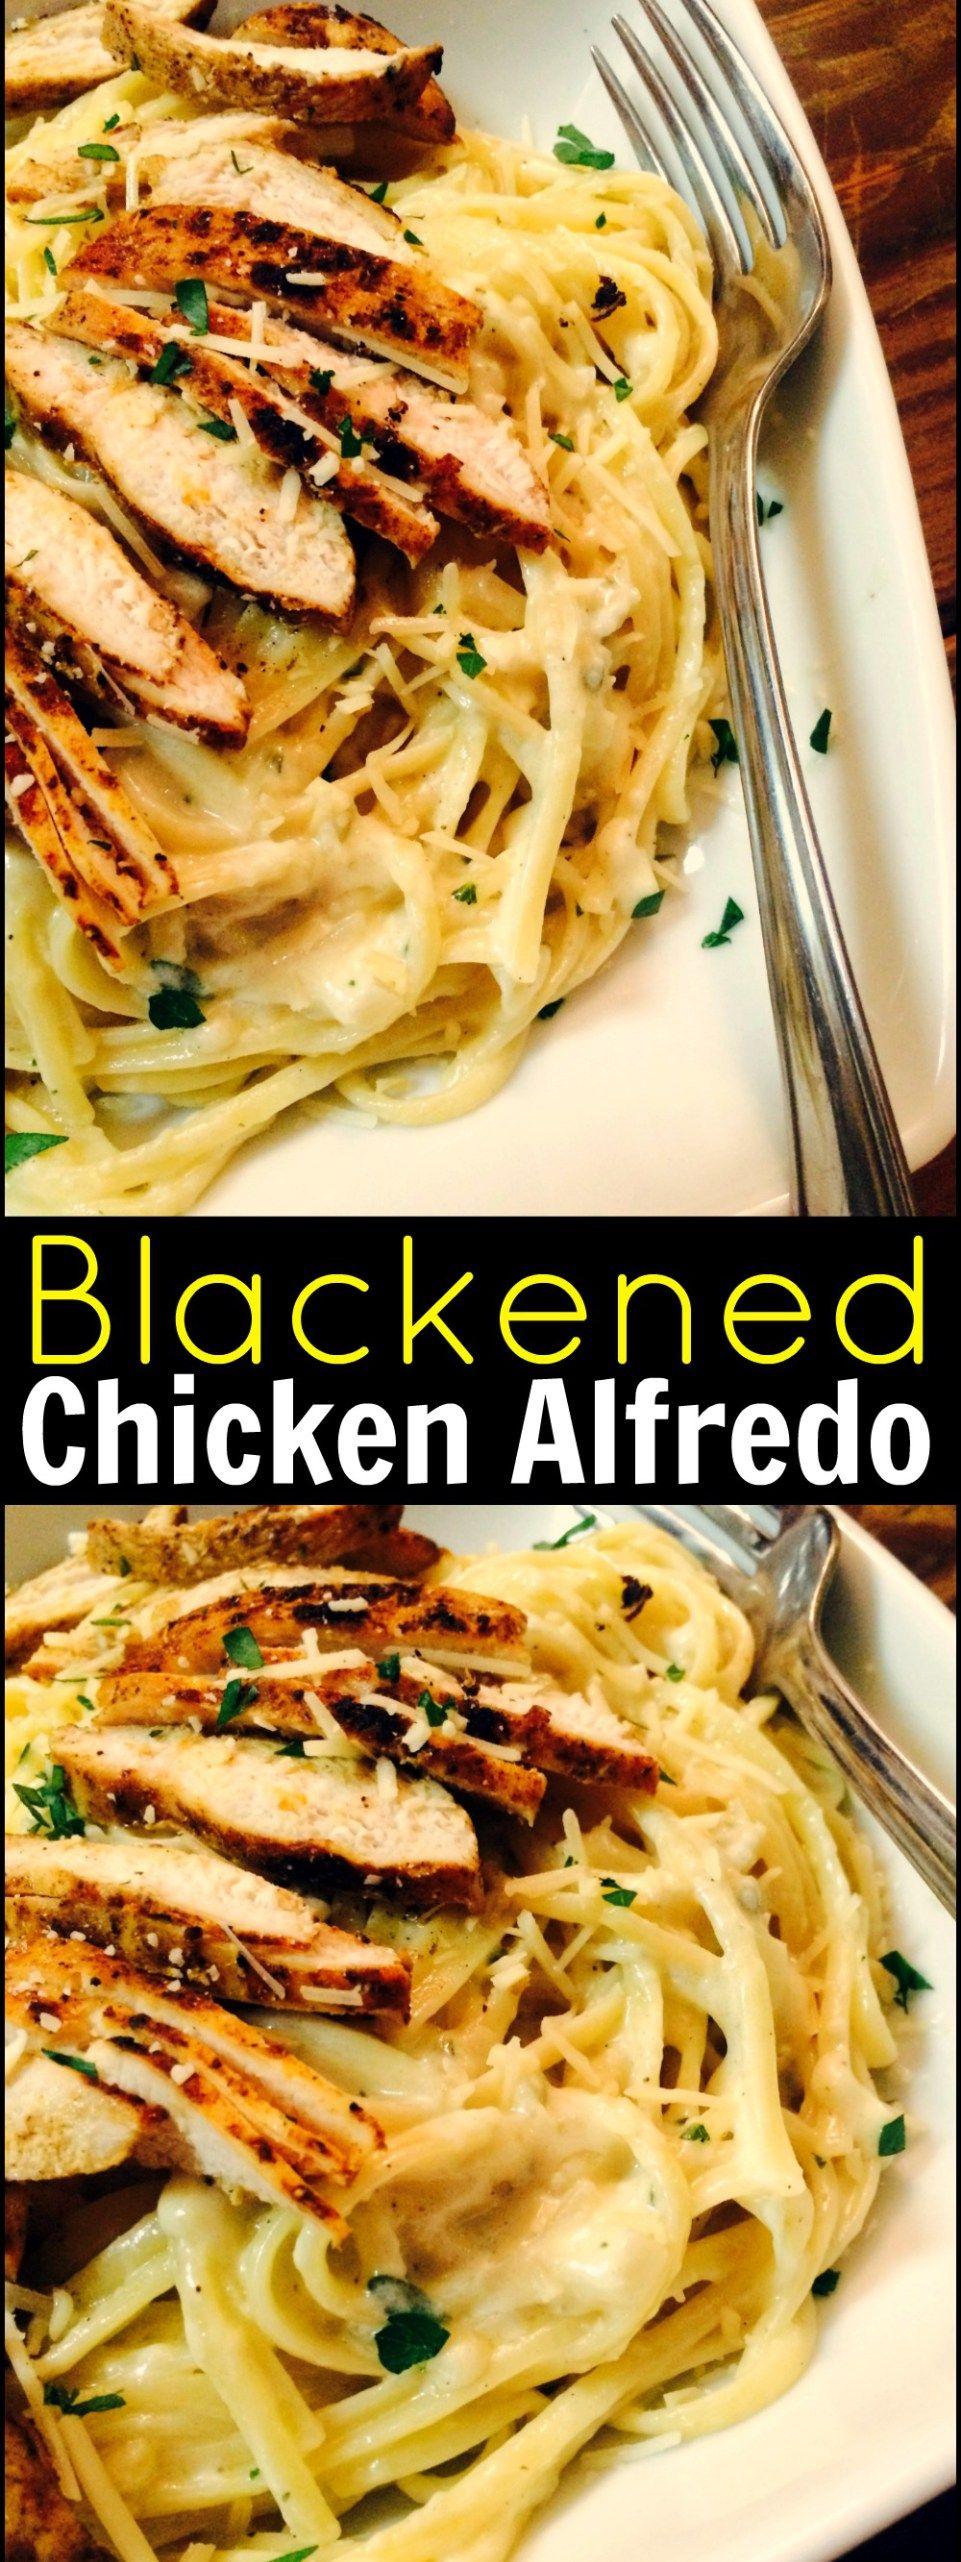 Blackened chicken alfredo aunt bees recipes recipes